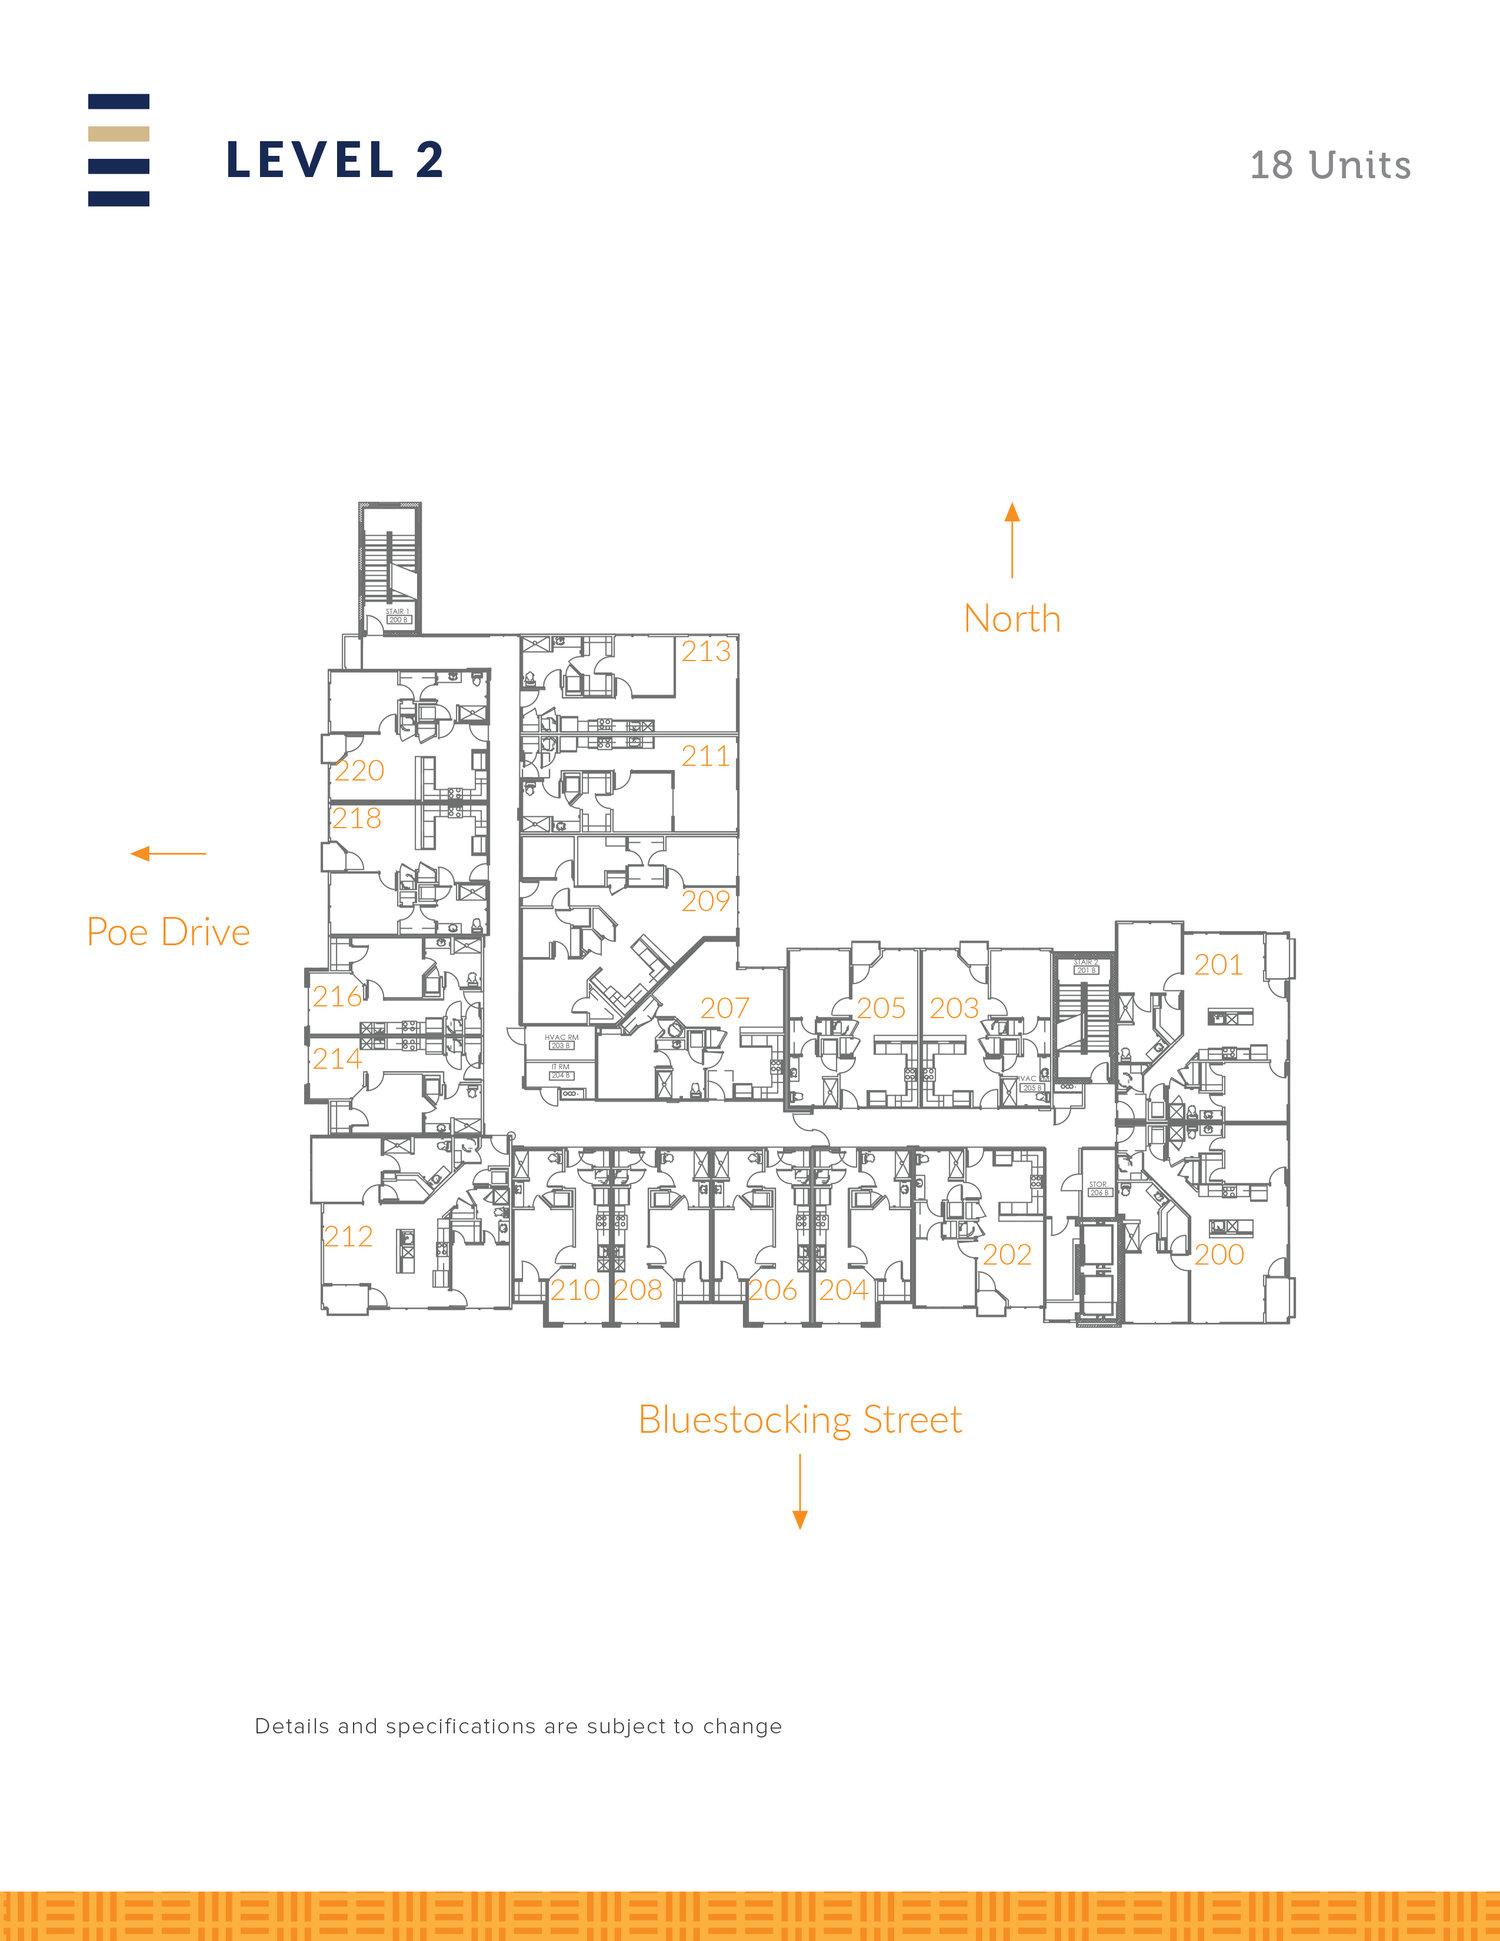 longview-raleigh-level-2.jpg